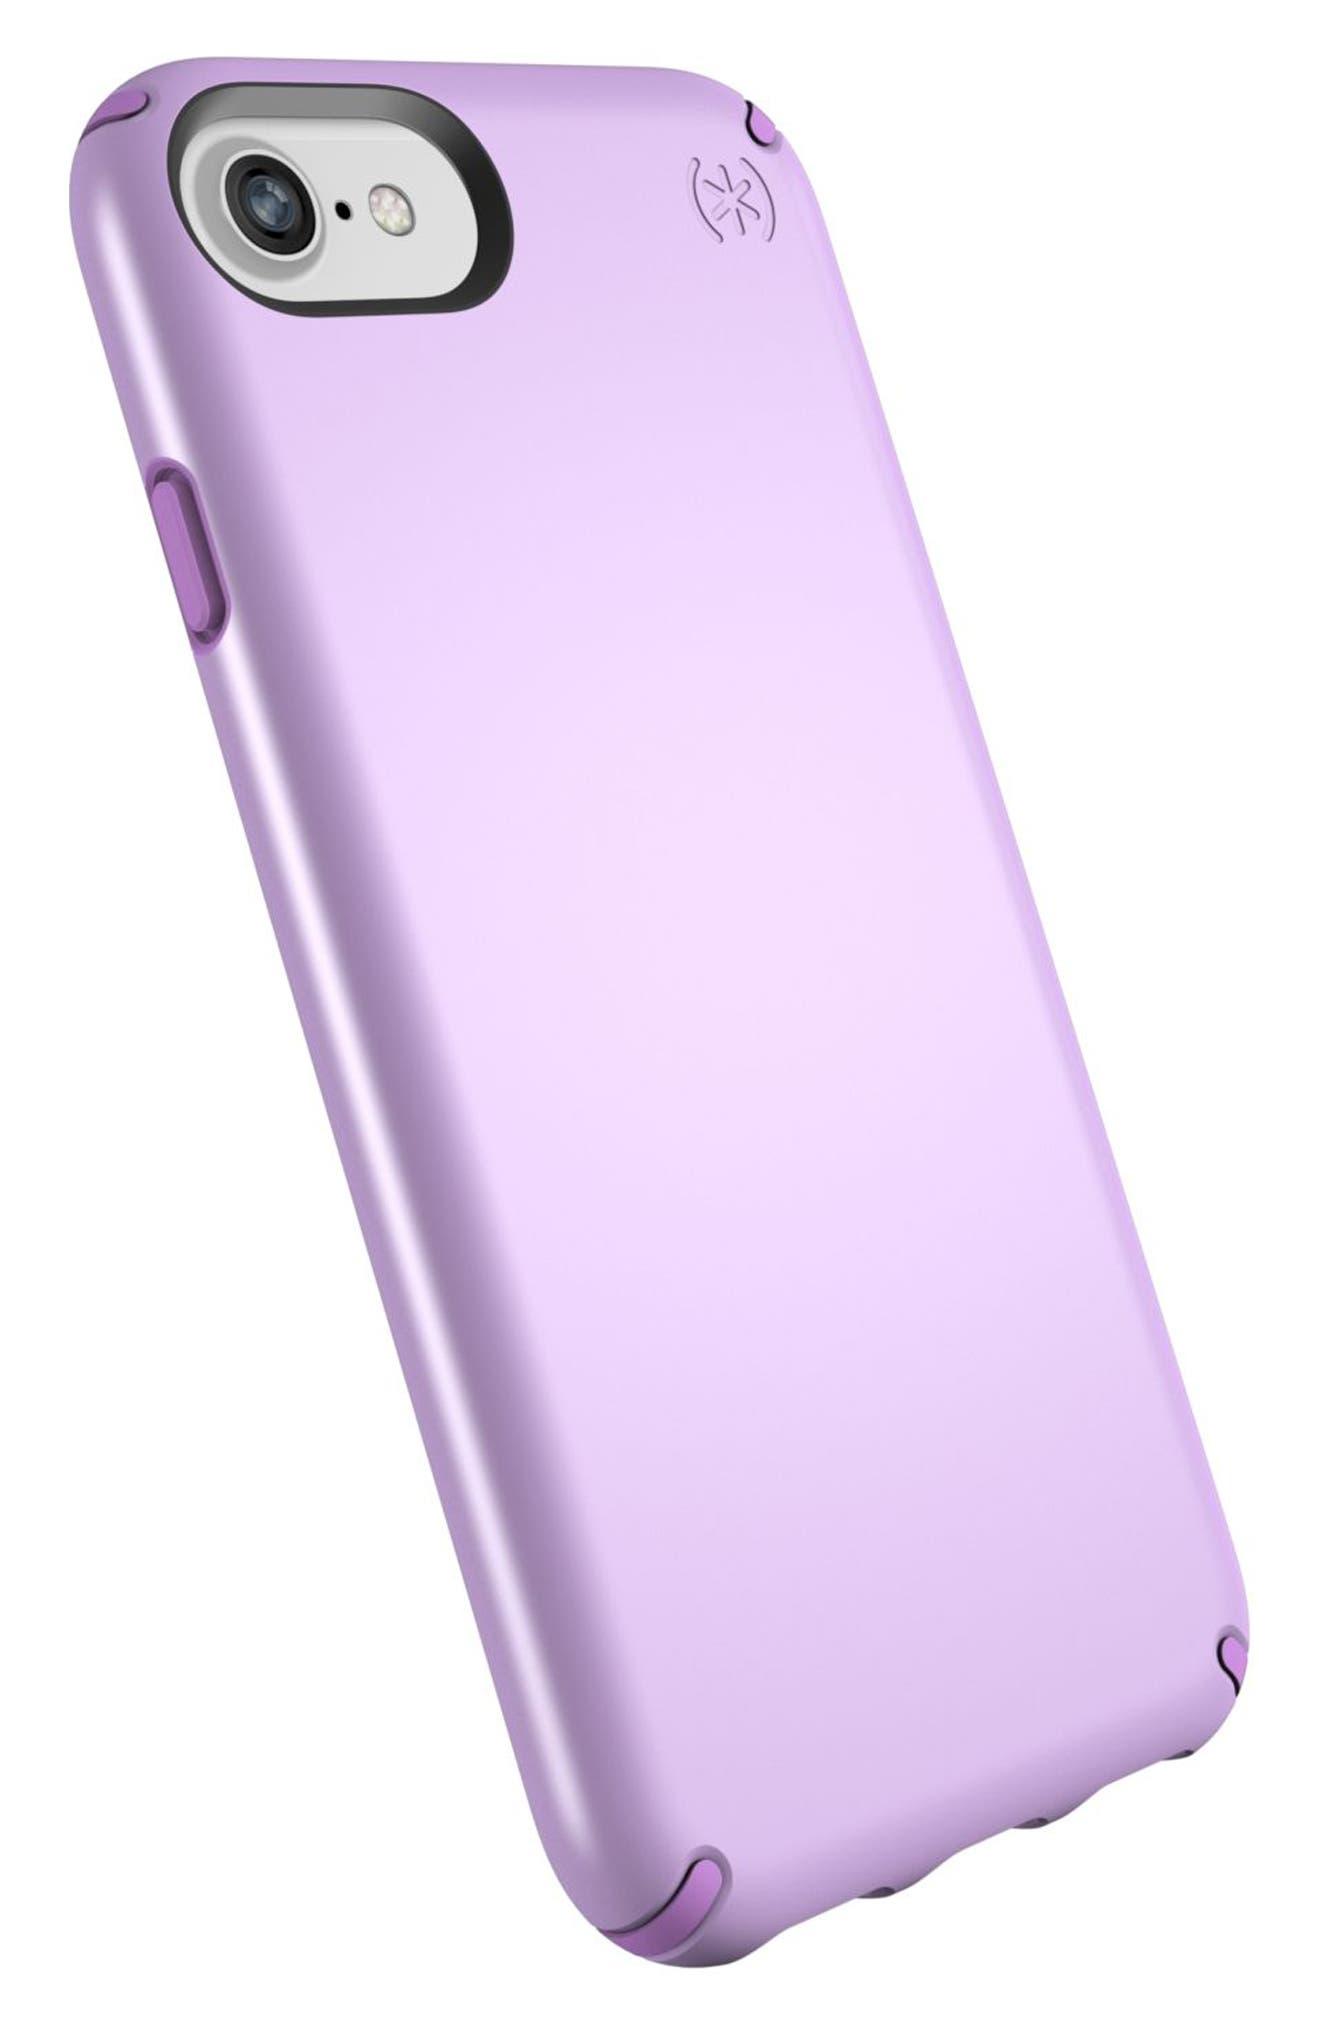 iPhone 6/6s/7/8 Case,                             Alternate thumbnail 8, color,                             500